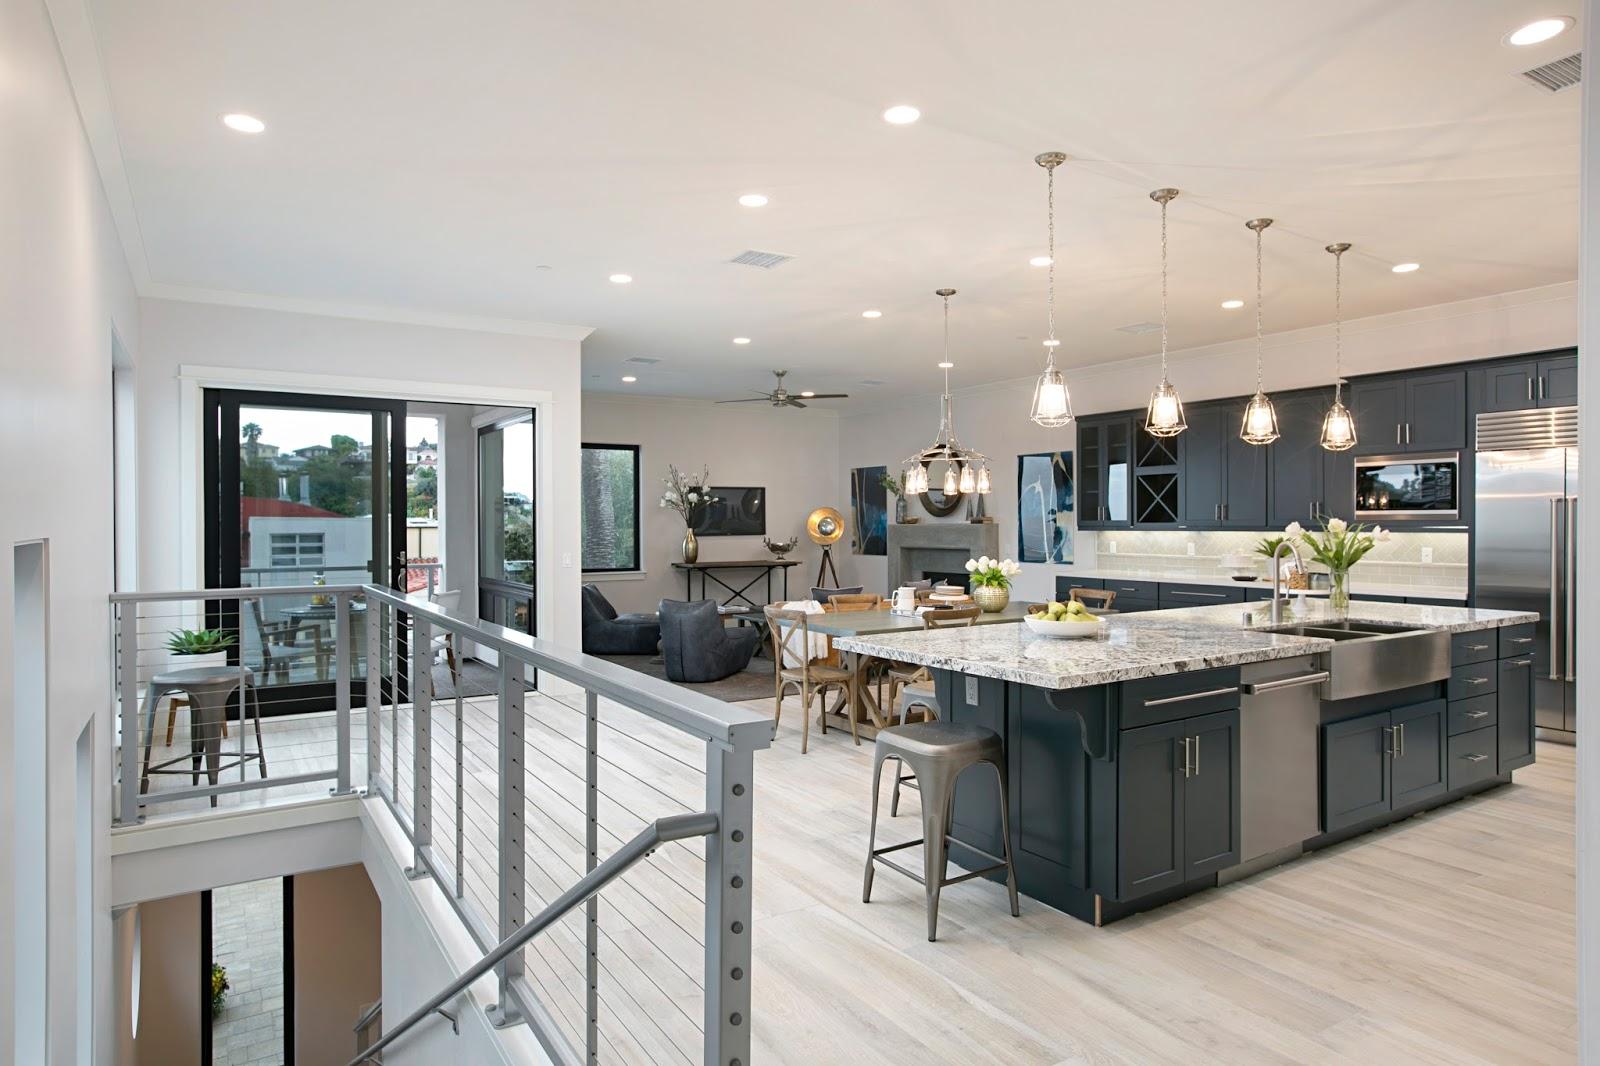 Blog | McCullough Design Development